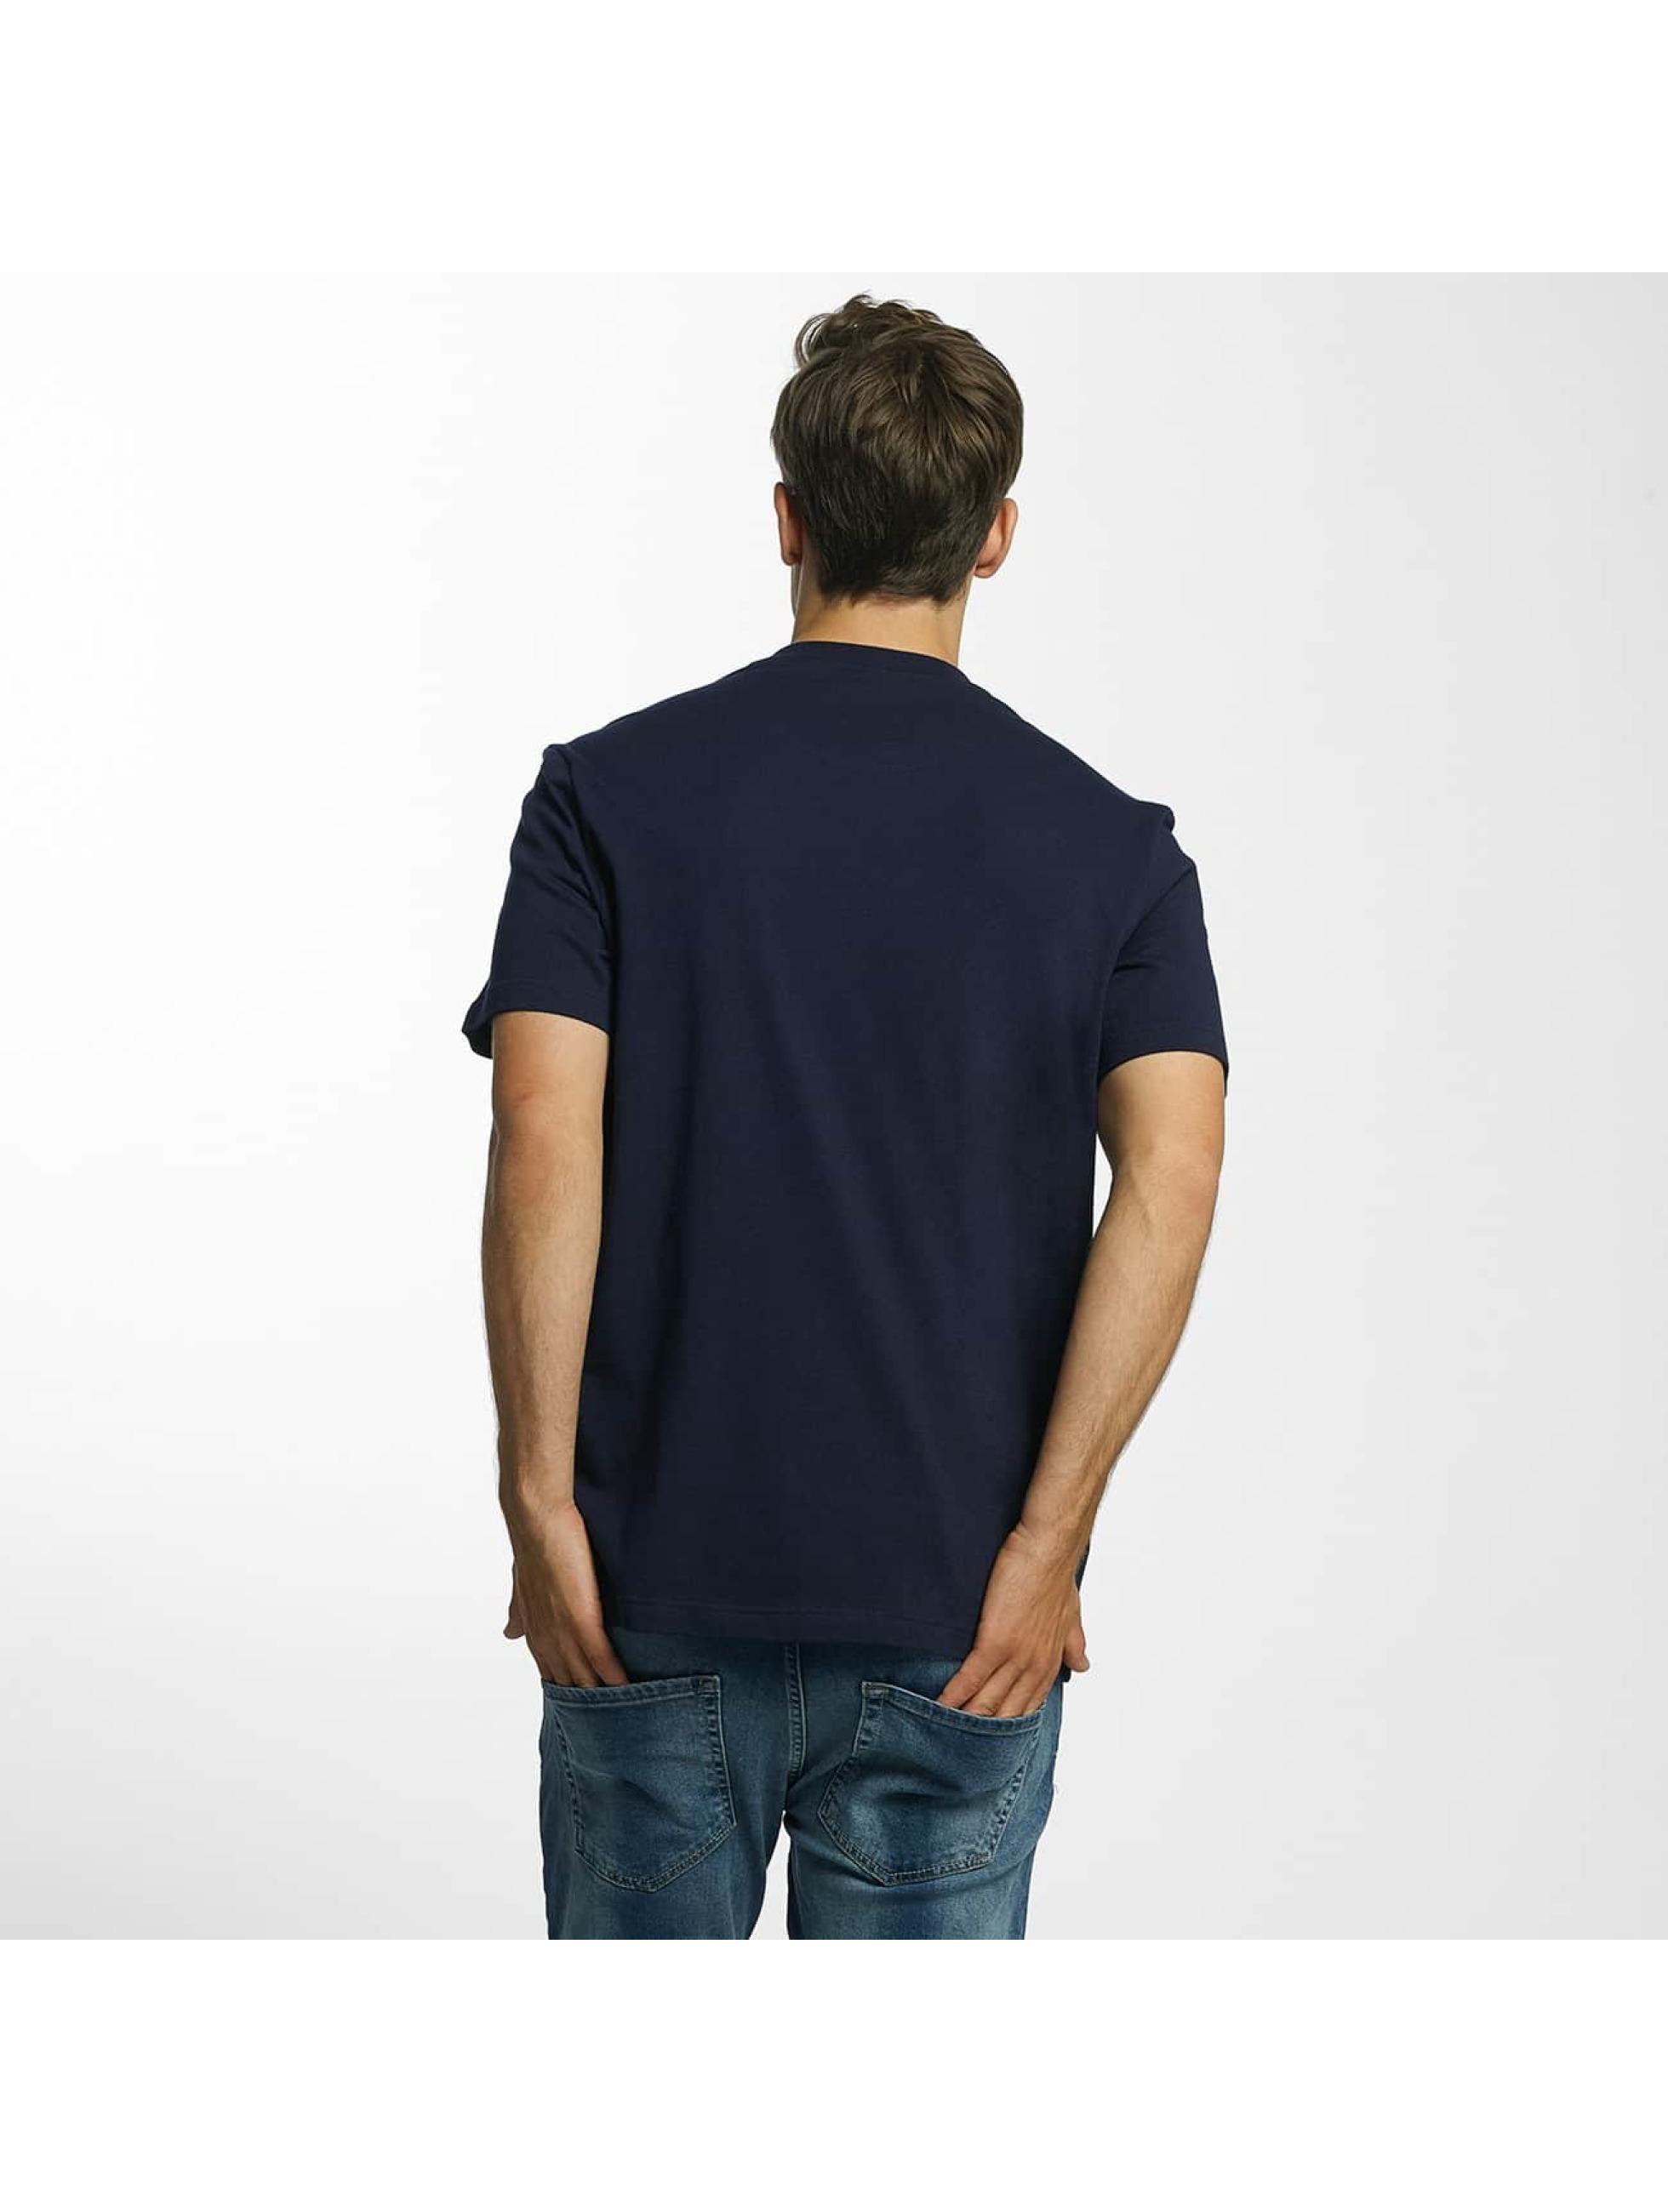 lacoste homme hauts t shirt original ebay. Black Bedroom Furniture Sets. Home Design Ideas